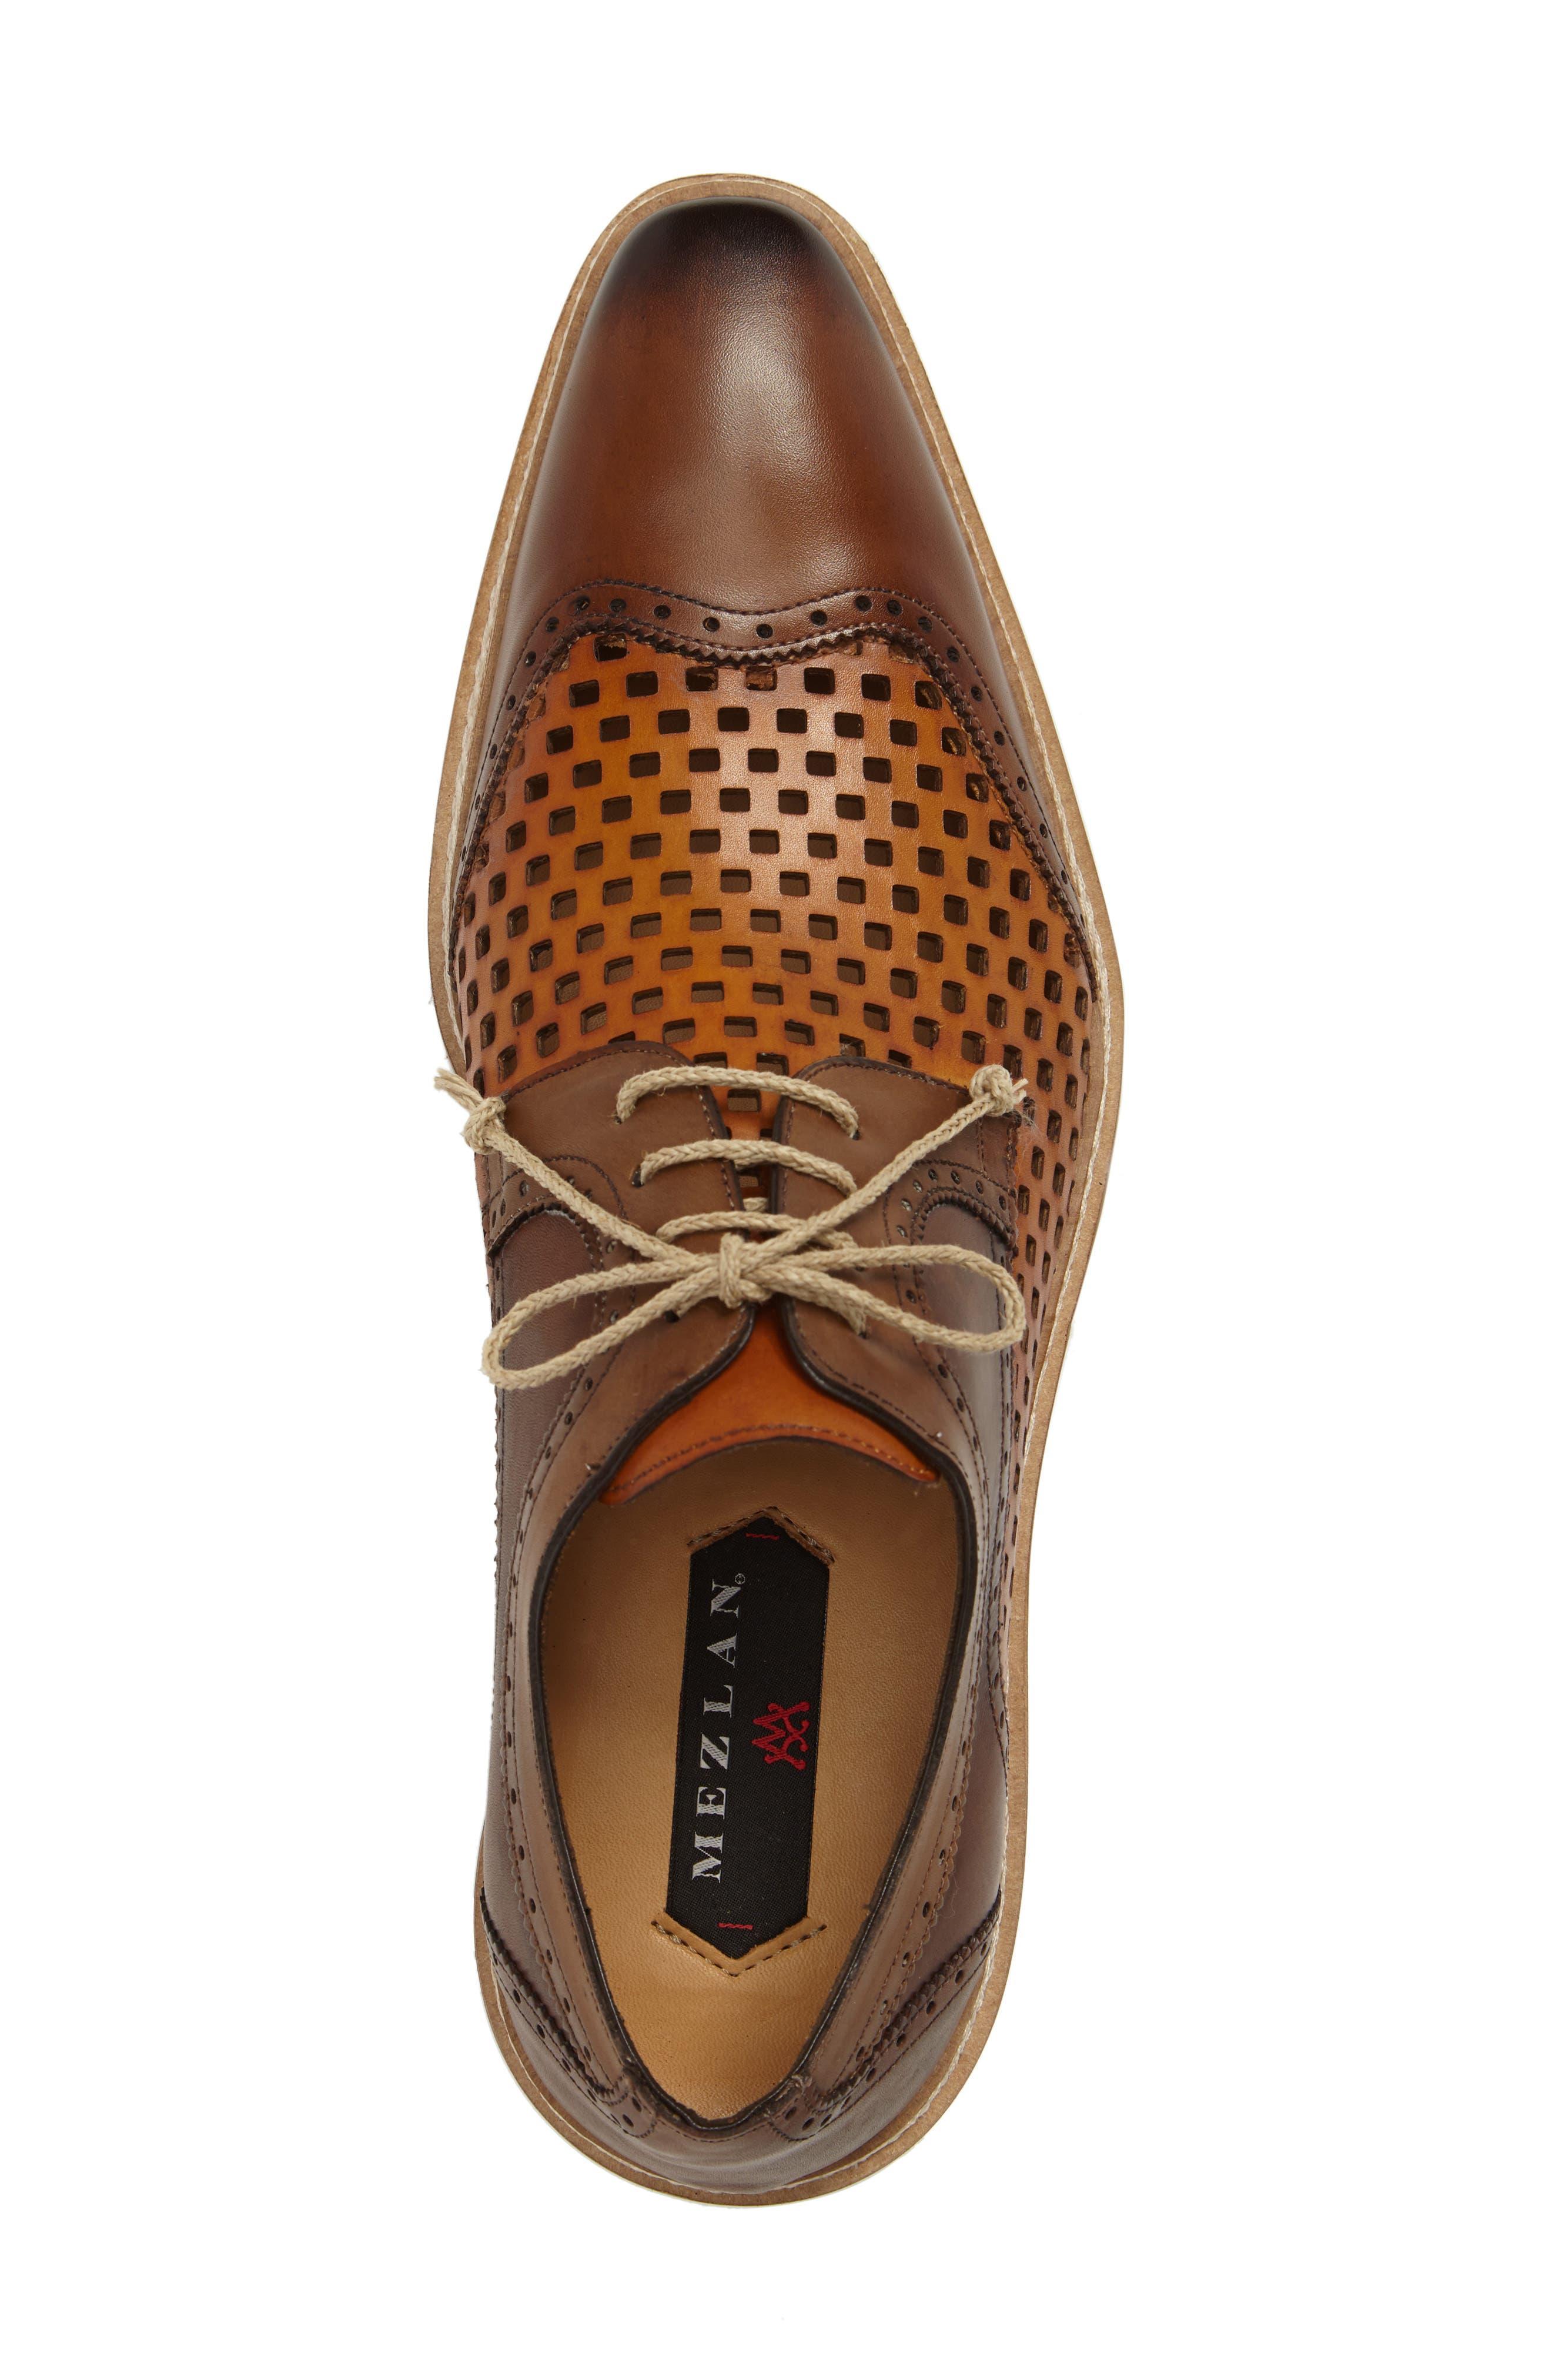 Alvarez Spectator Shoe,                             Alternate thumbnail 5, color,                             Cognac Multi Leather